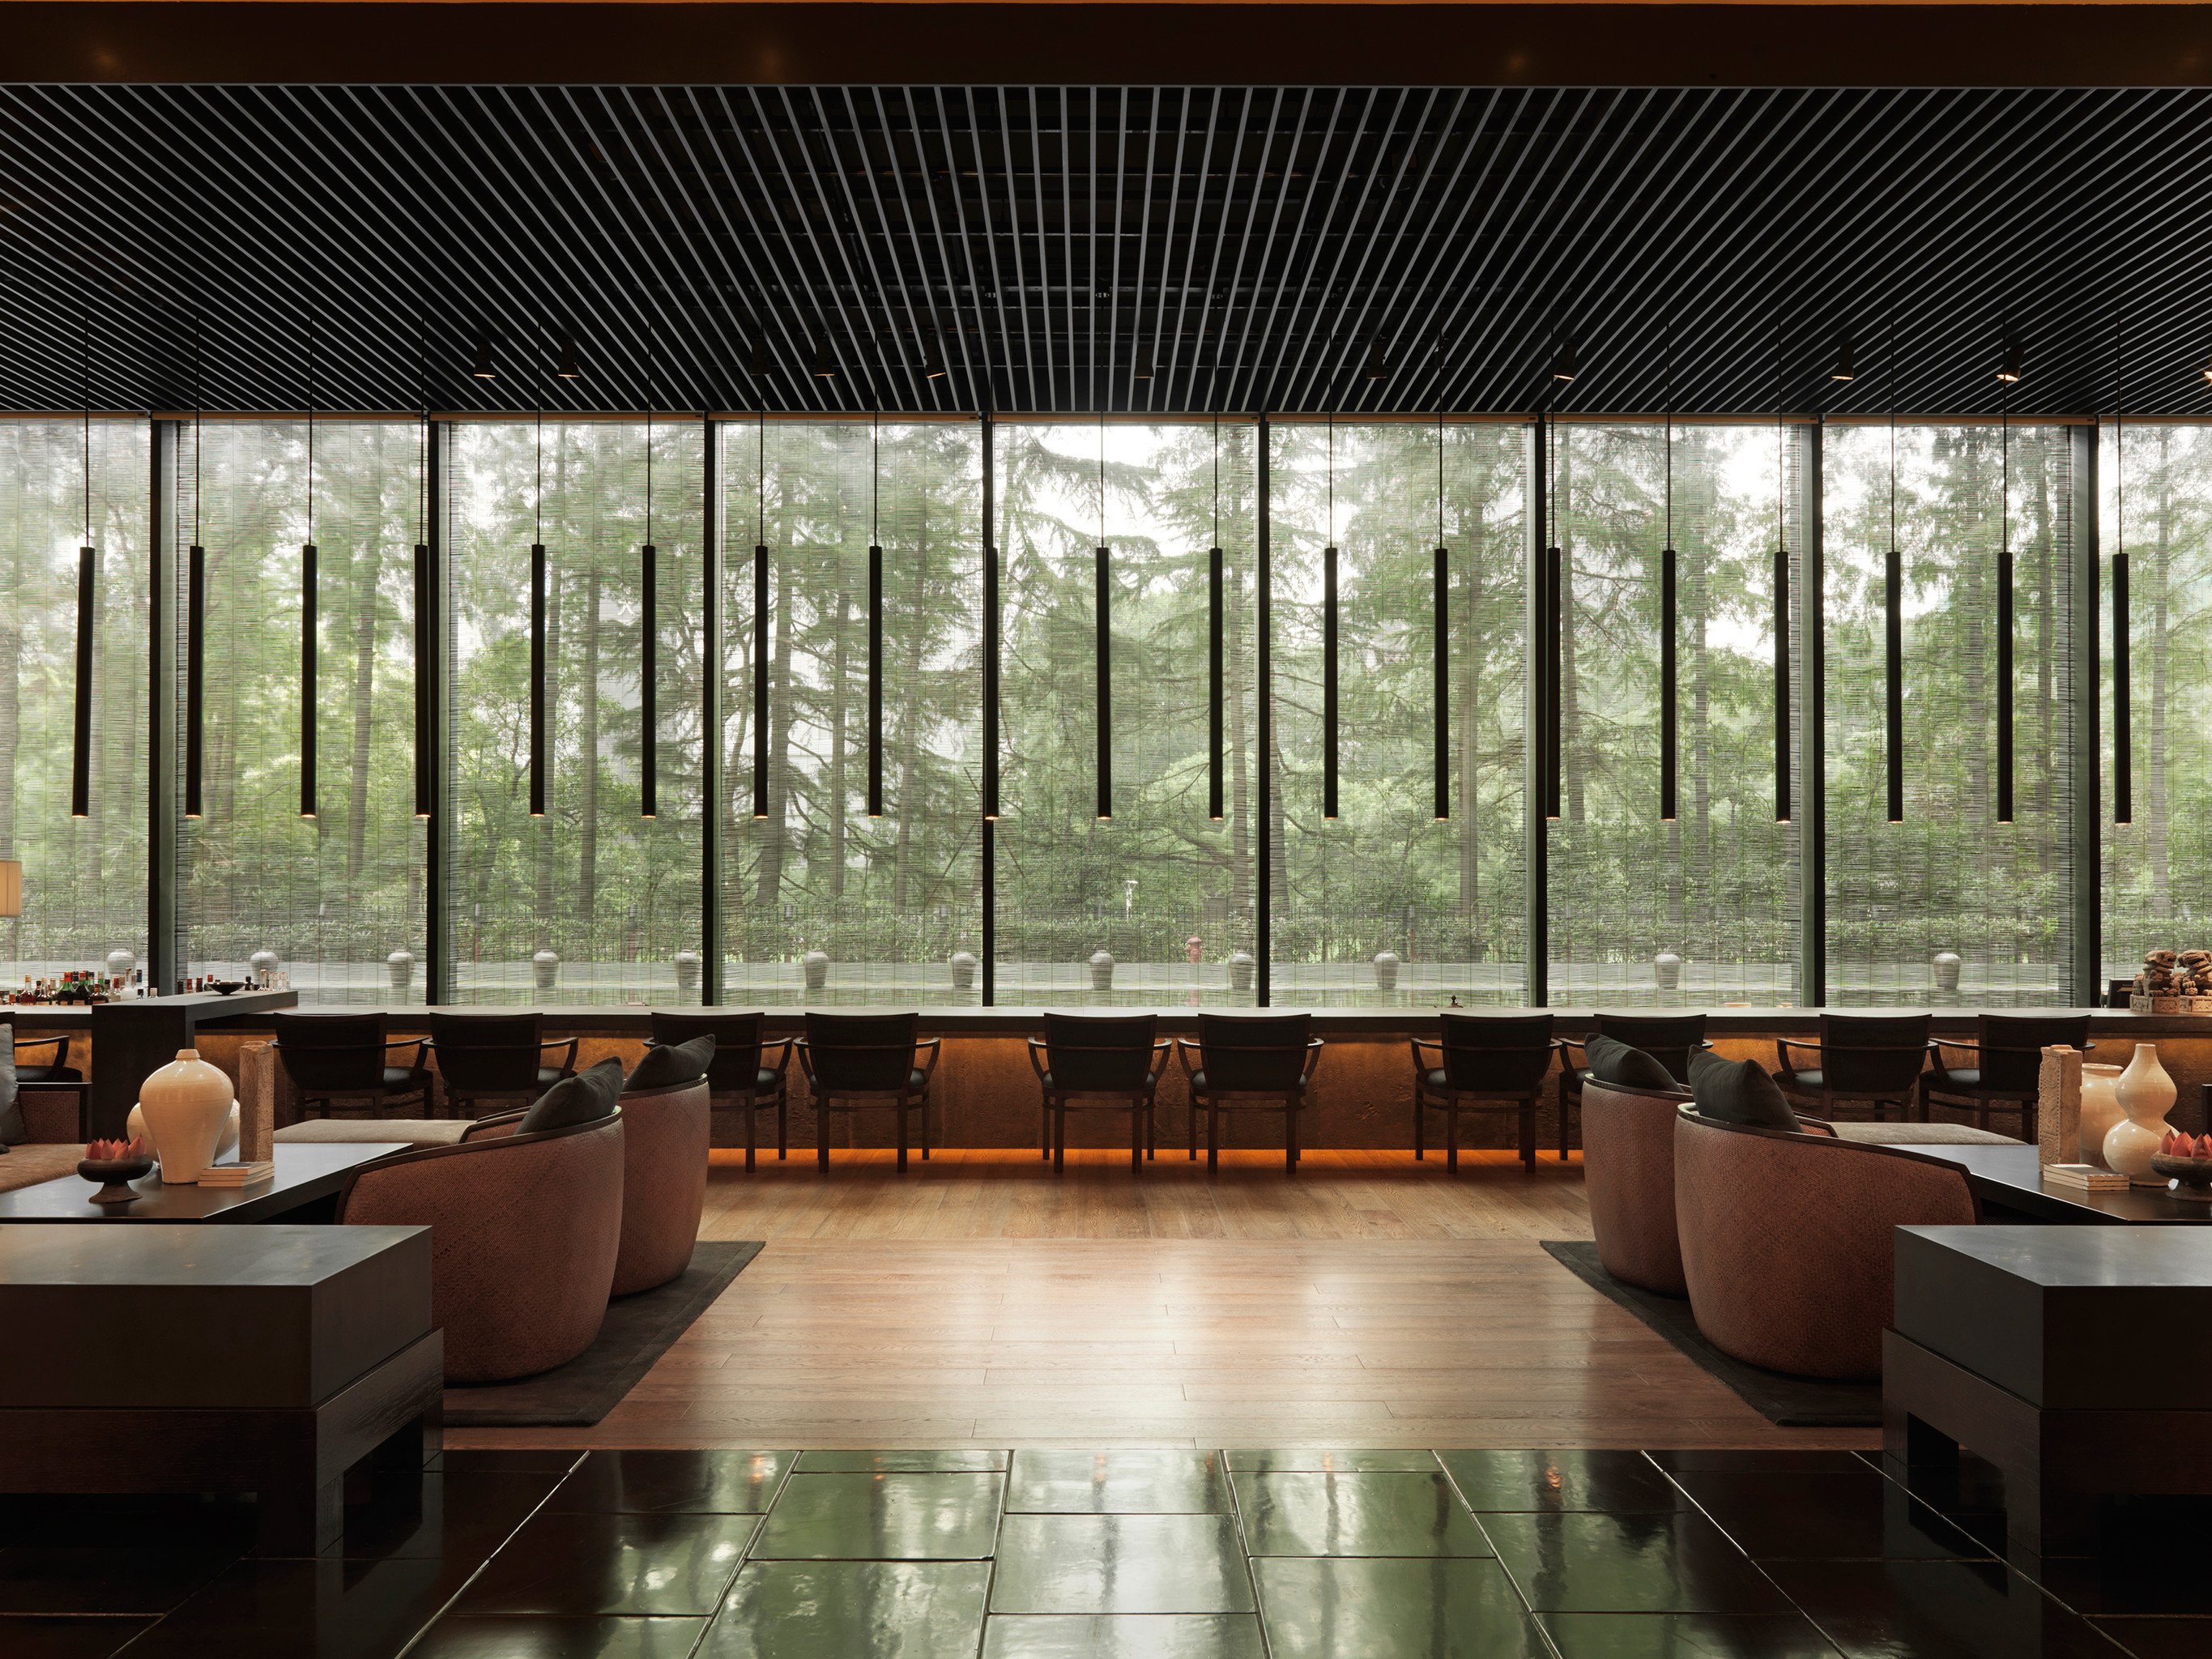 Elegant Hip Hotels Living Lounge Luxury Modern Trip Ideas indoor Lobby Architecture interior design window covering Design estate professional auditorium headquarters several